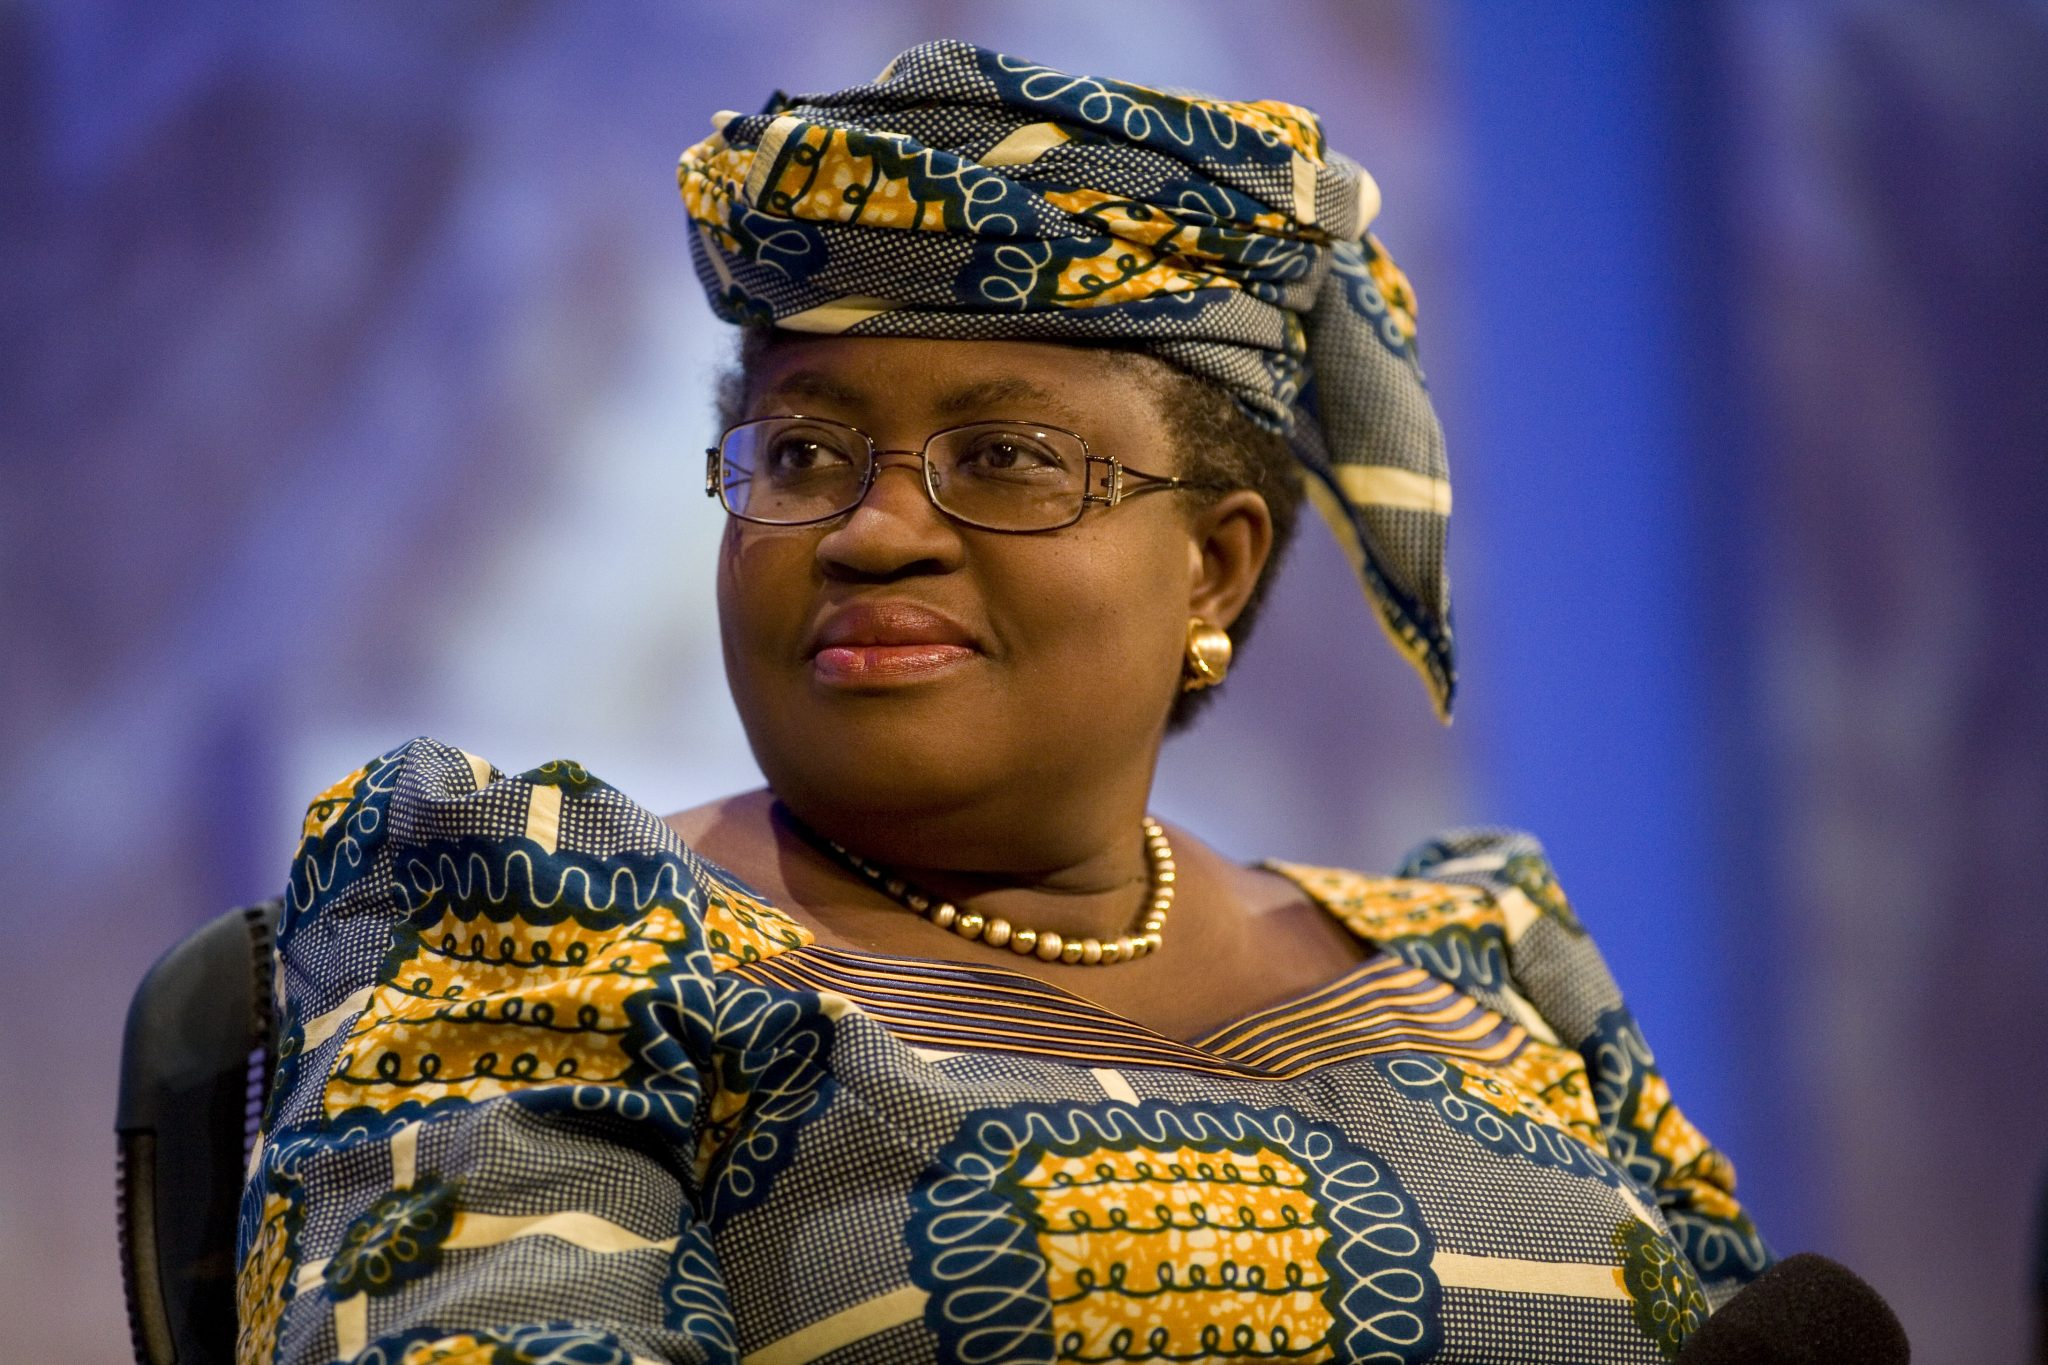 WHO appoints Okonjo-Iweala as Special Envoy on COVID-19